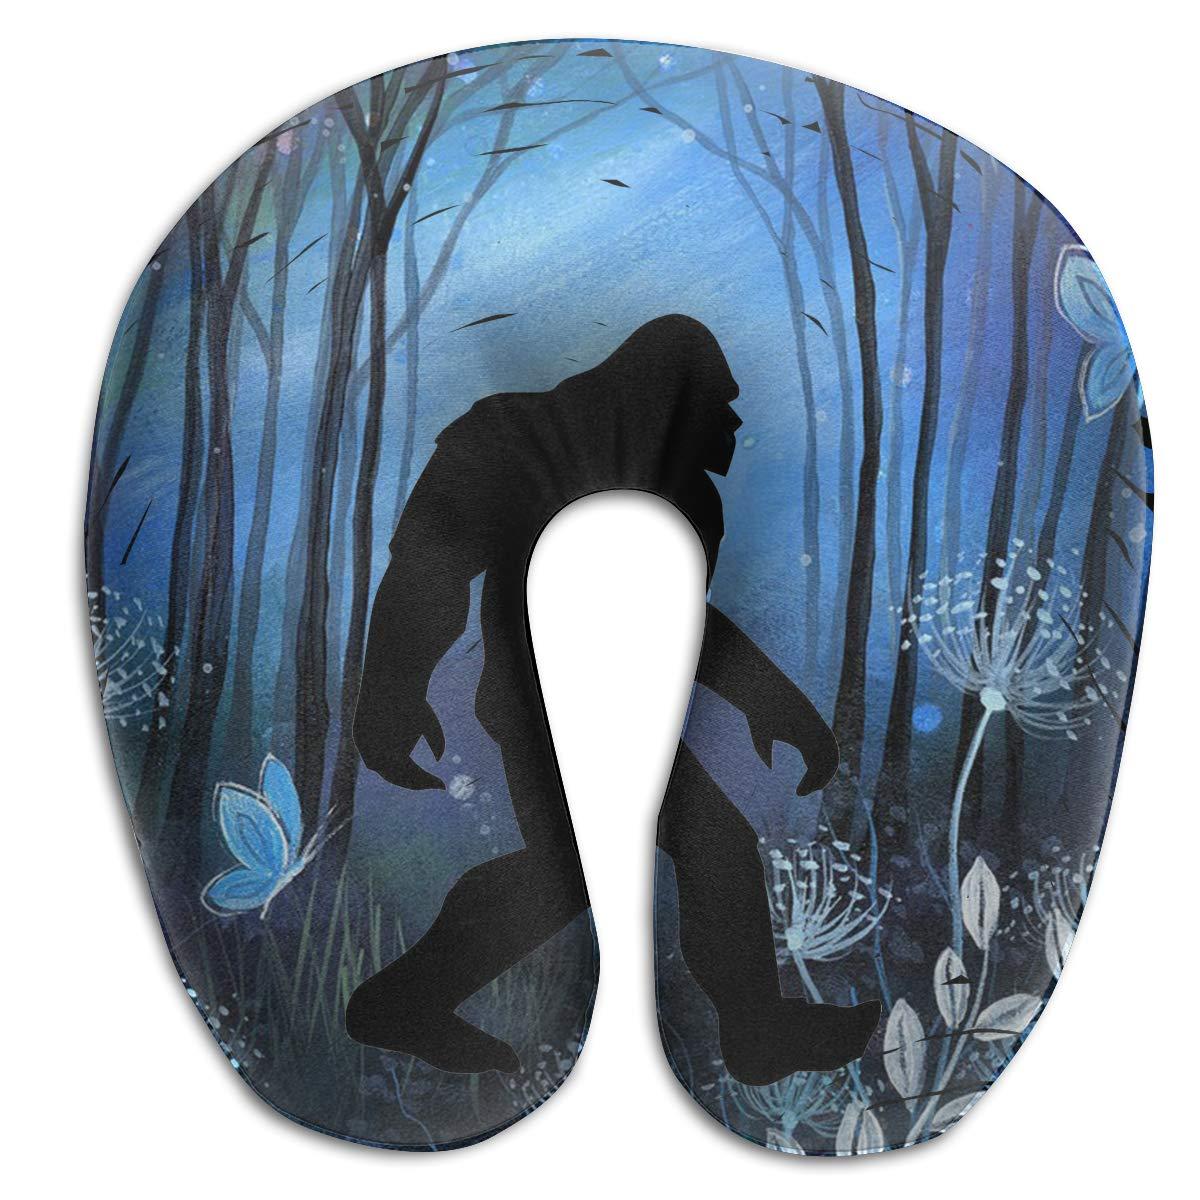 Wodehous Adonis Comfort Retro Into The Wood Bigfoot Sasquatch Memory Foam Neck Pillows Neck-Supportive Travel Pillow